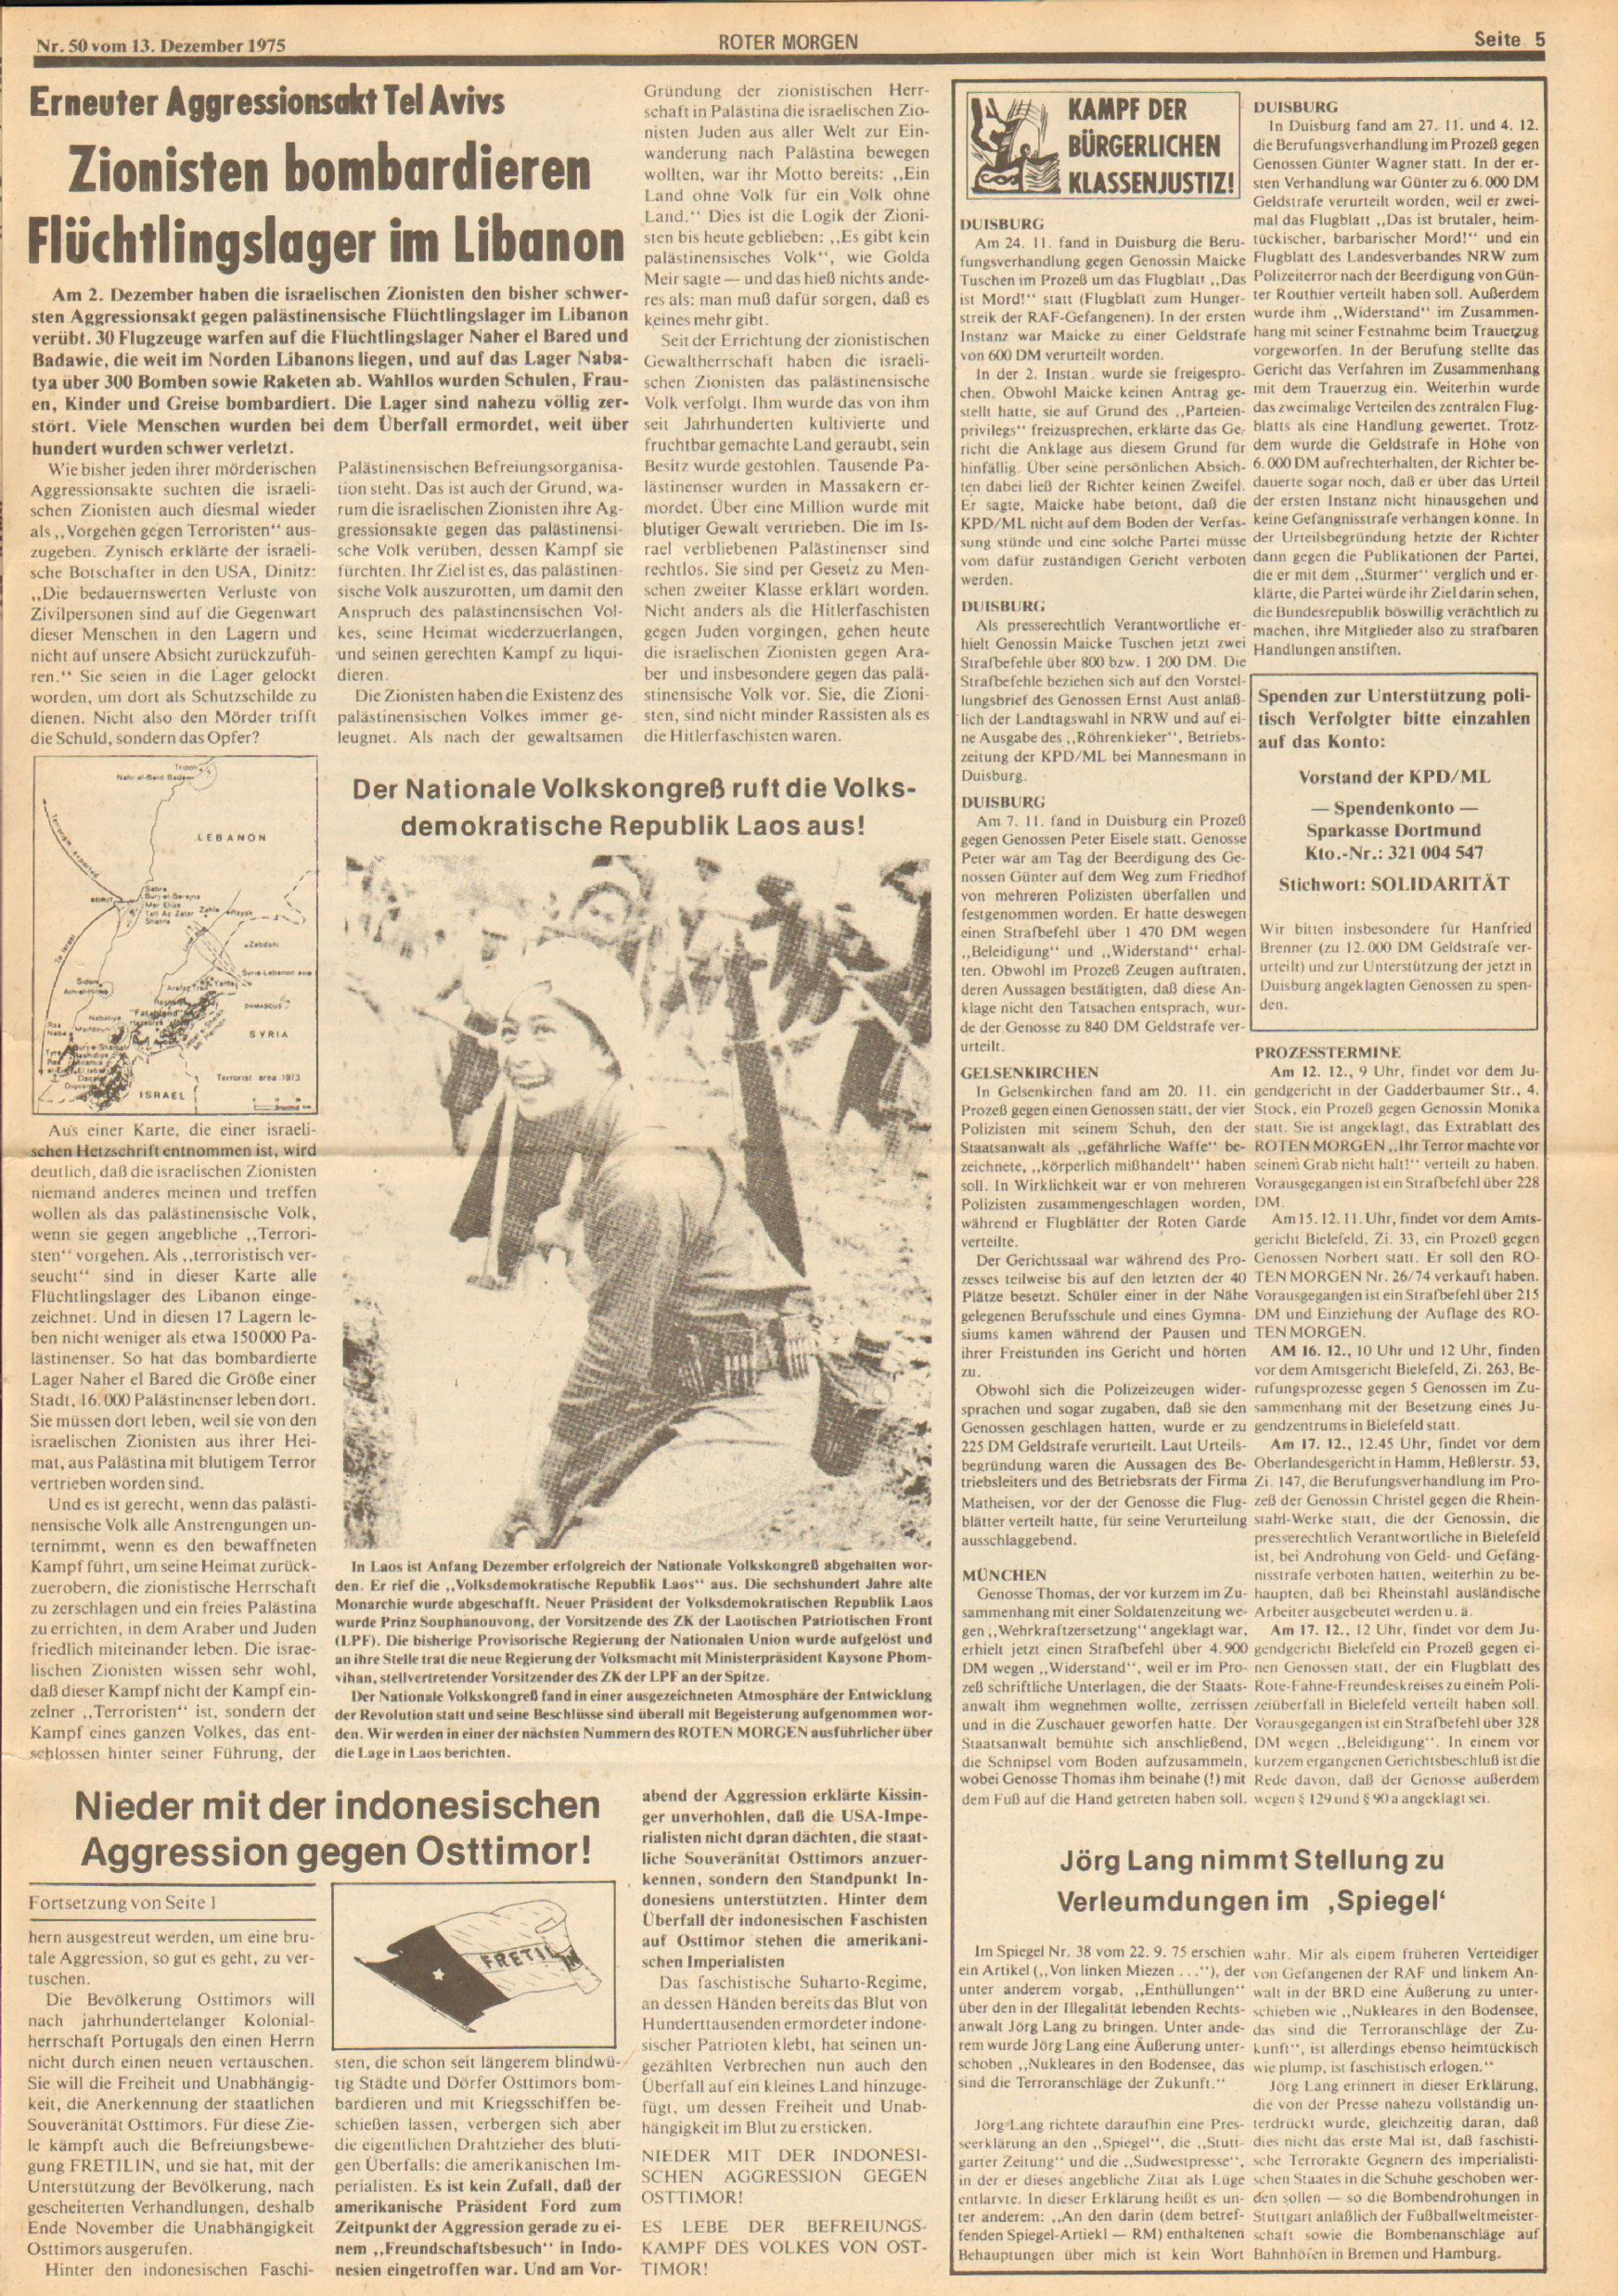 Roter Morgen, 9. Jg., 13. Dezember 1975, Nr. 50, Seite 5